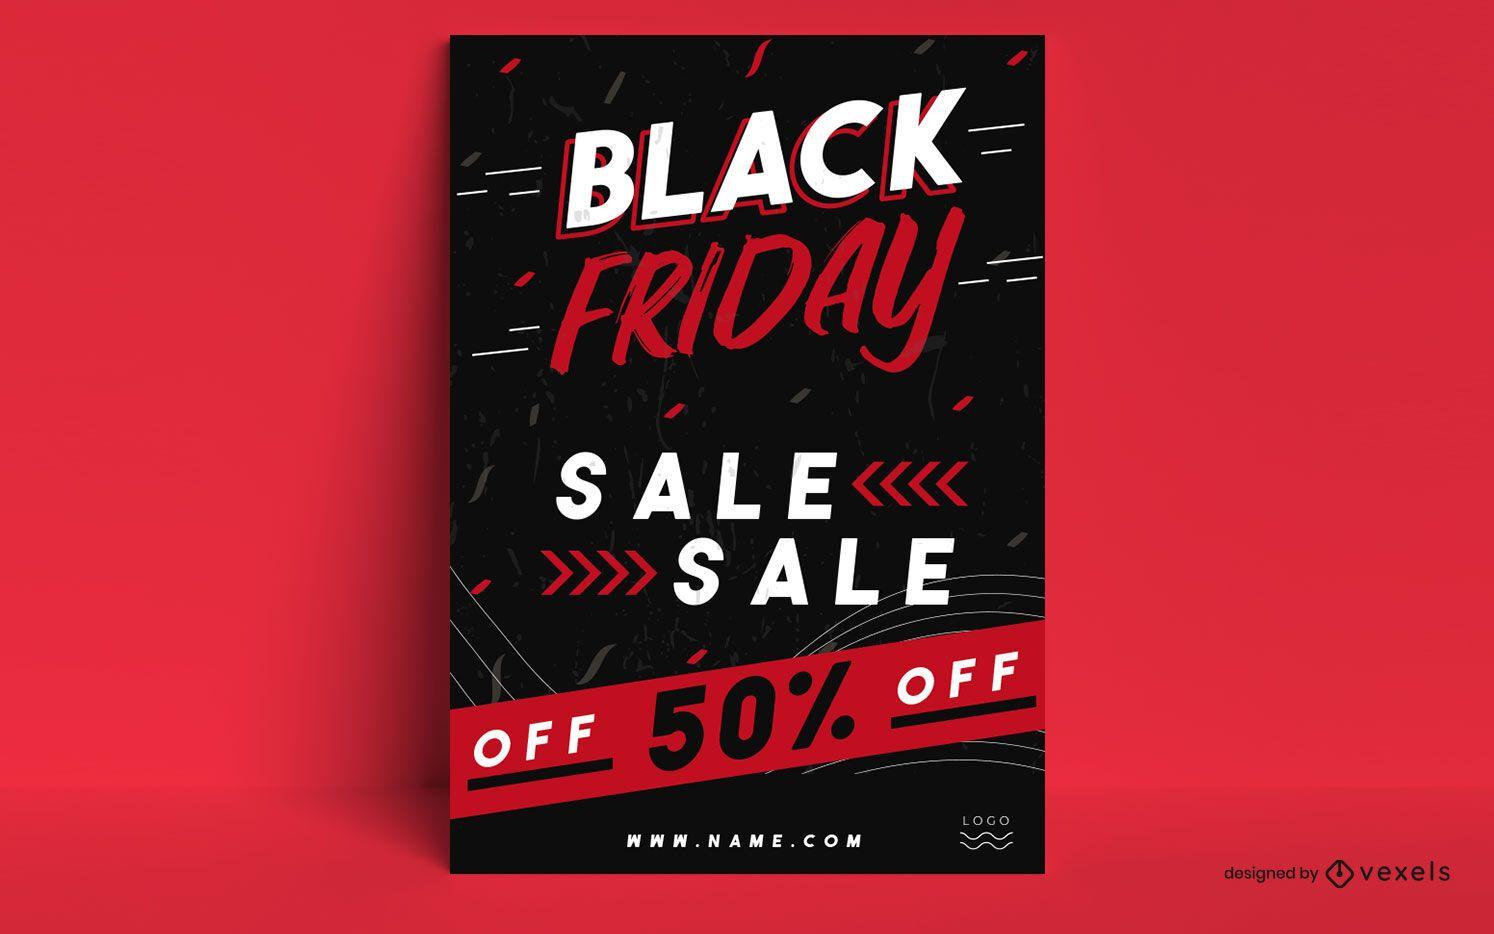 Black friday promo poster design